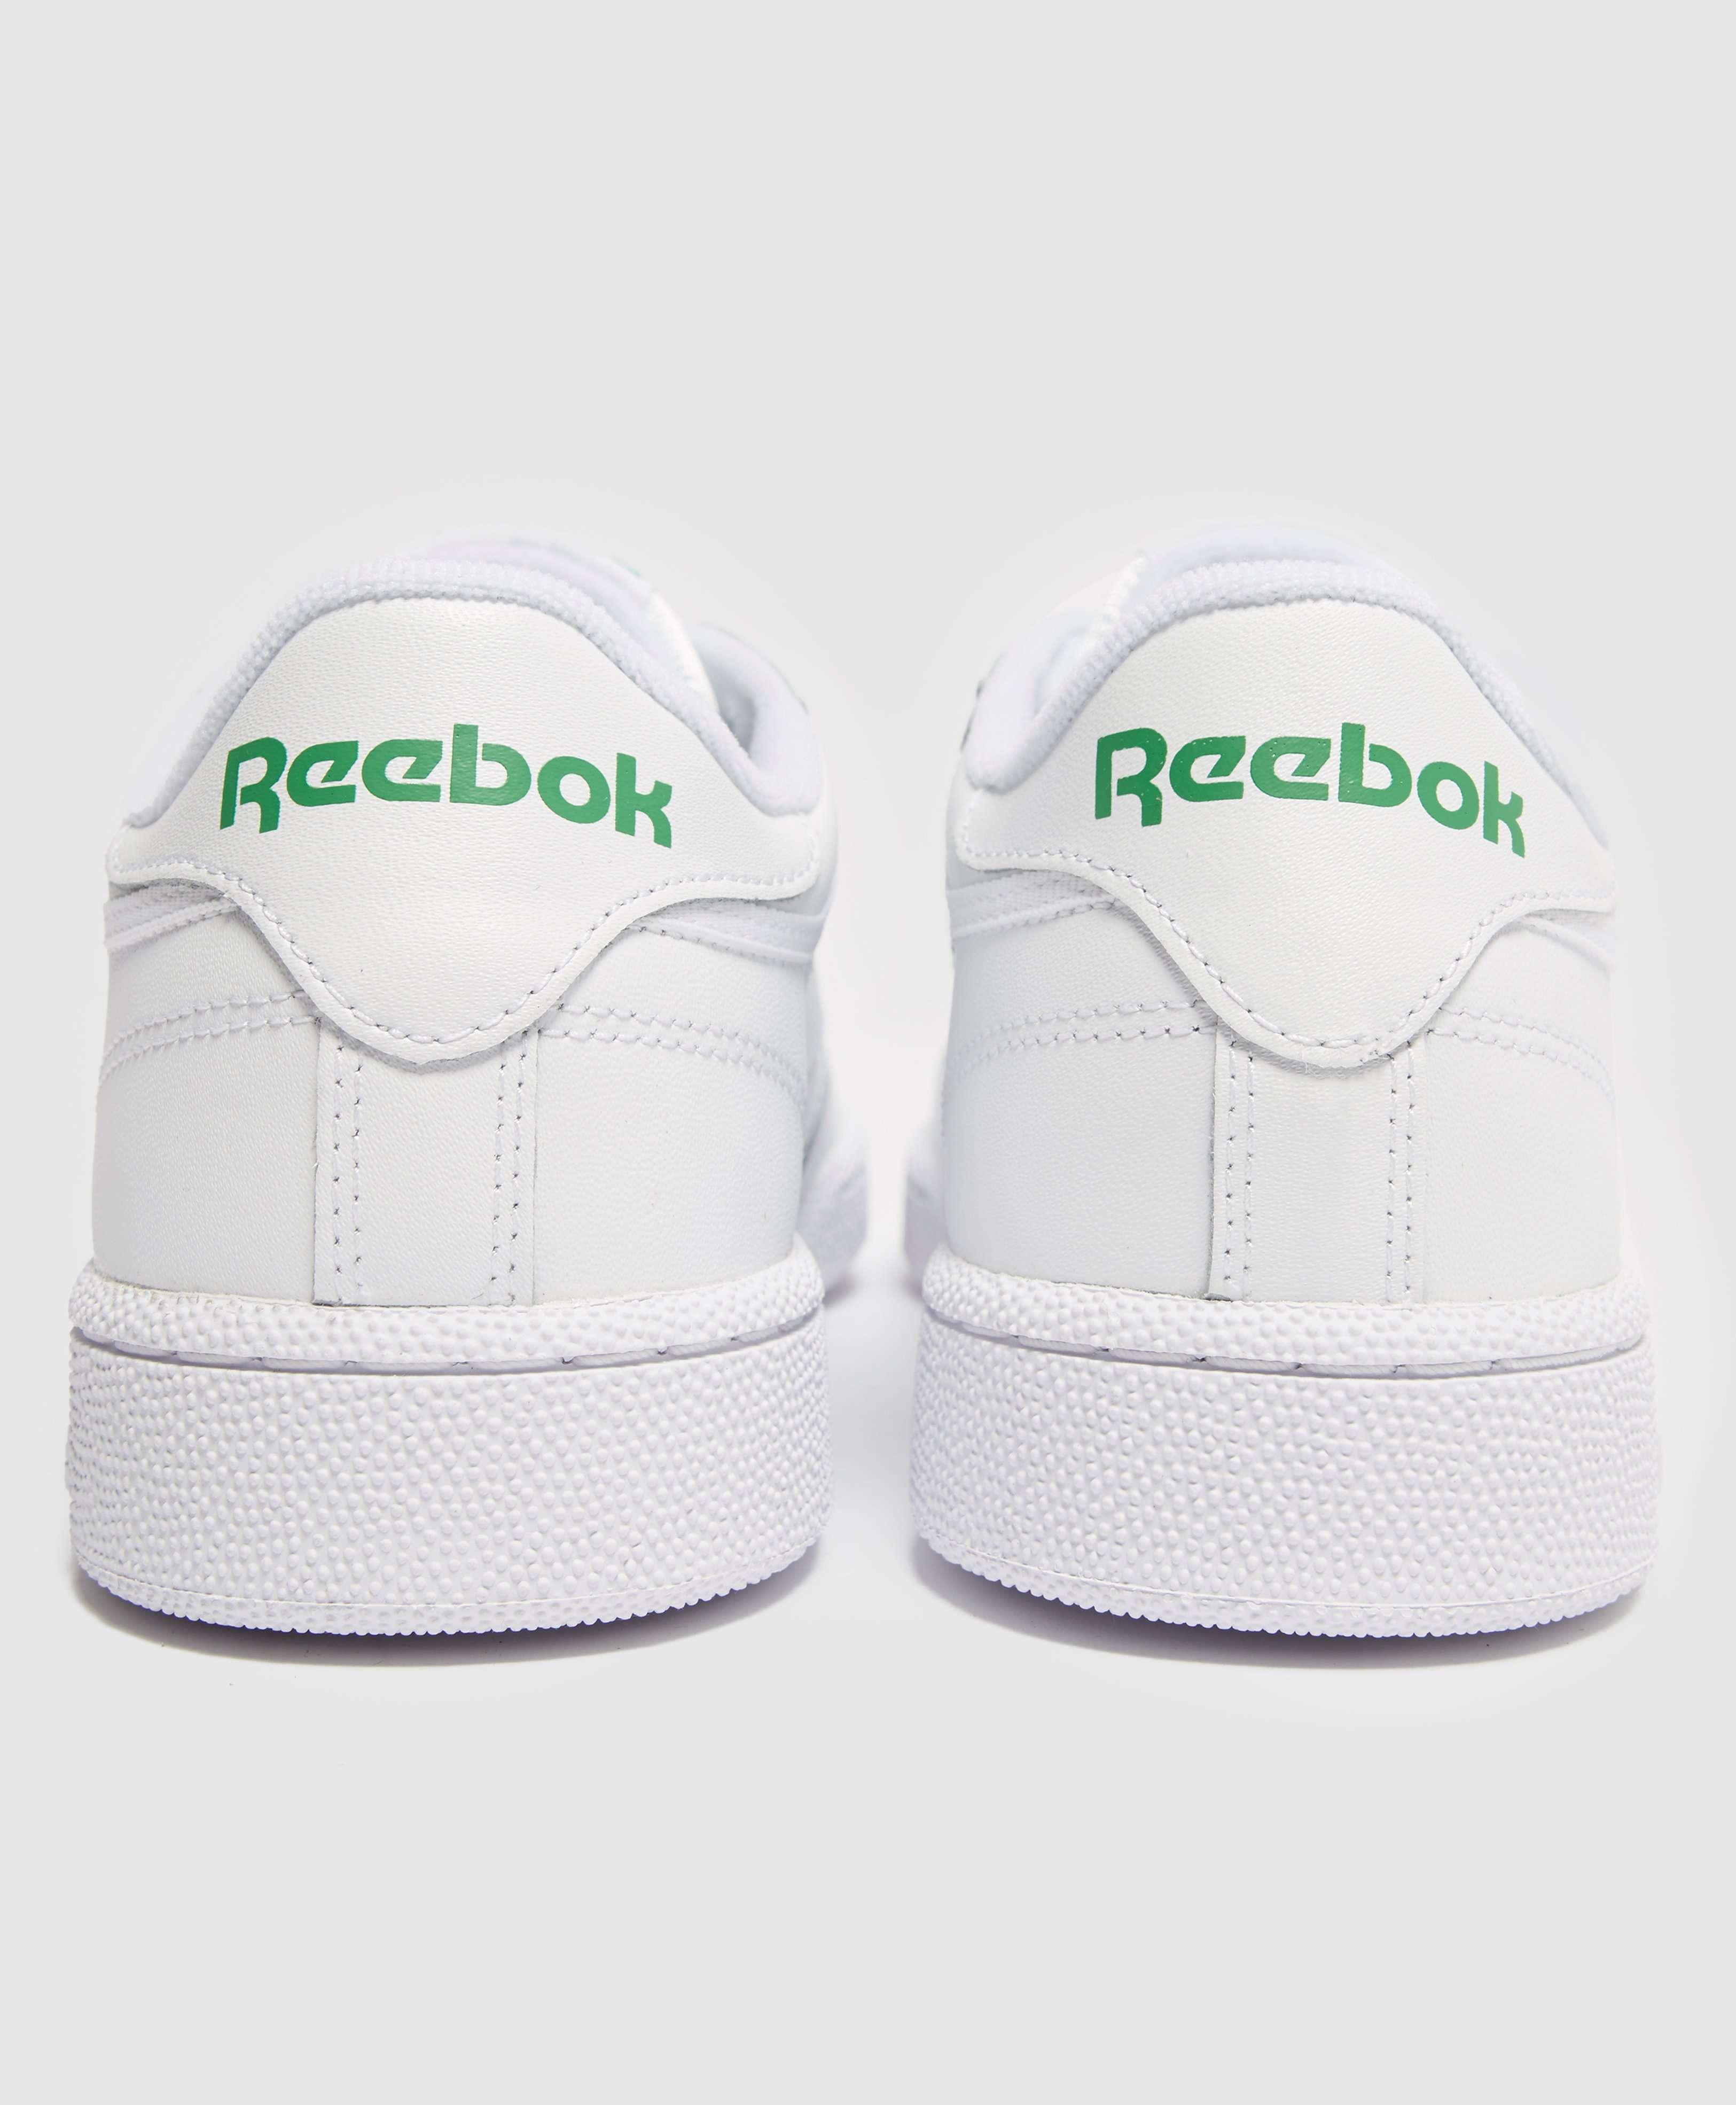 Reebok Club C 85 Leather